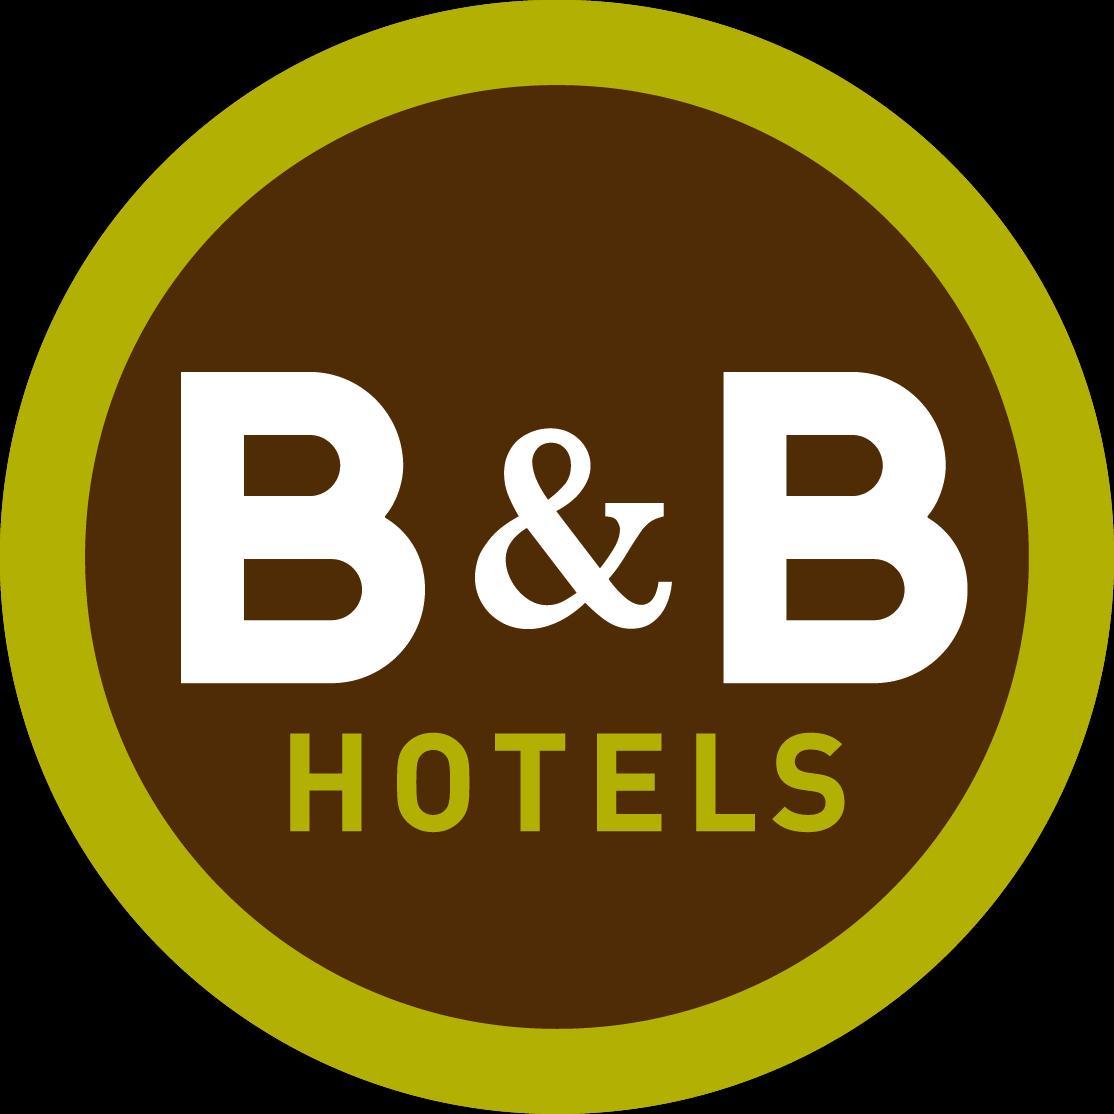 B&b Hotel Pézenas